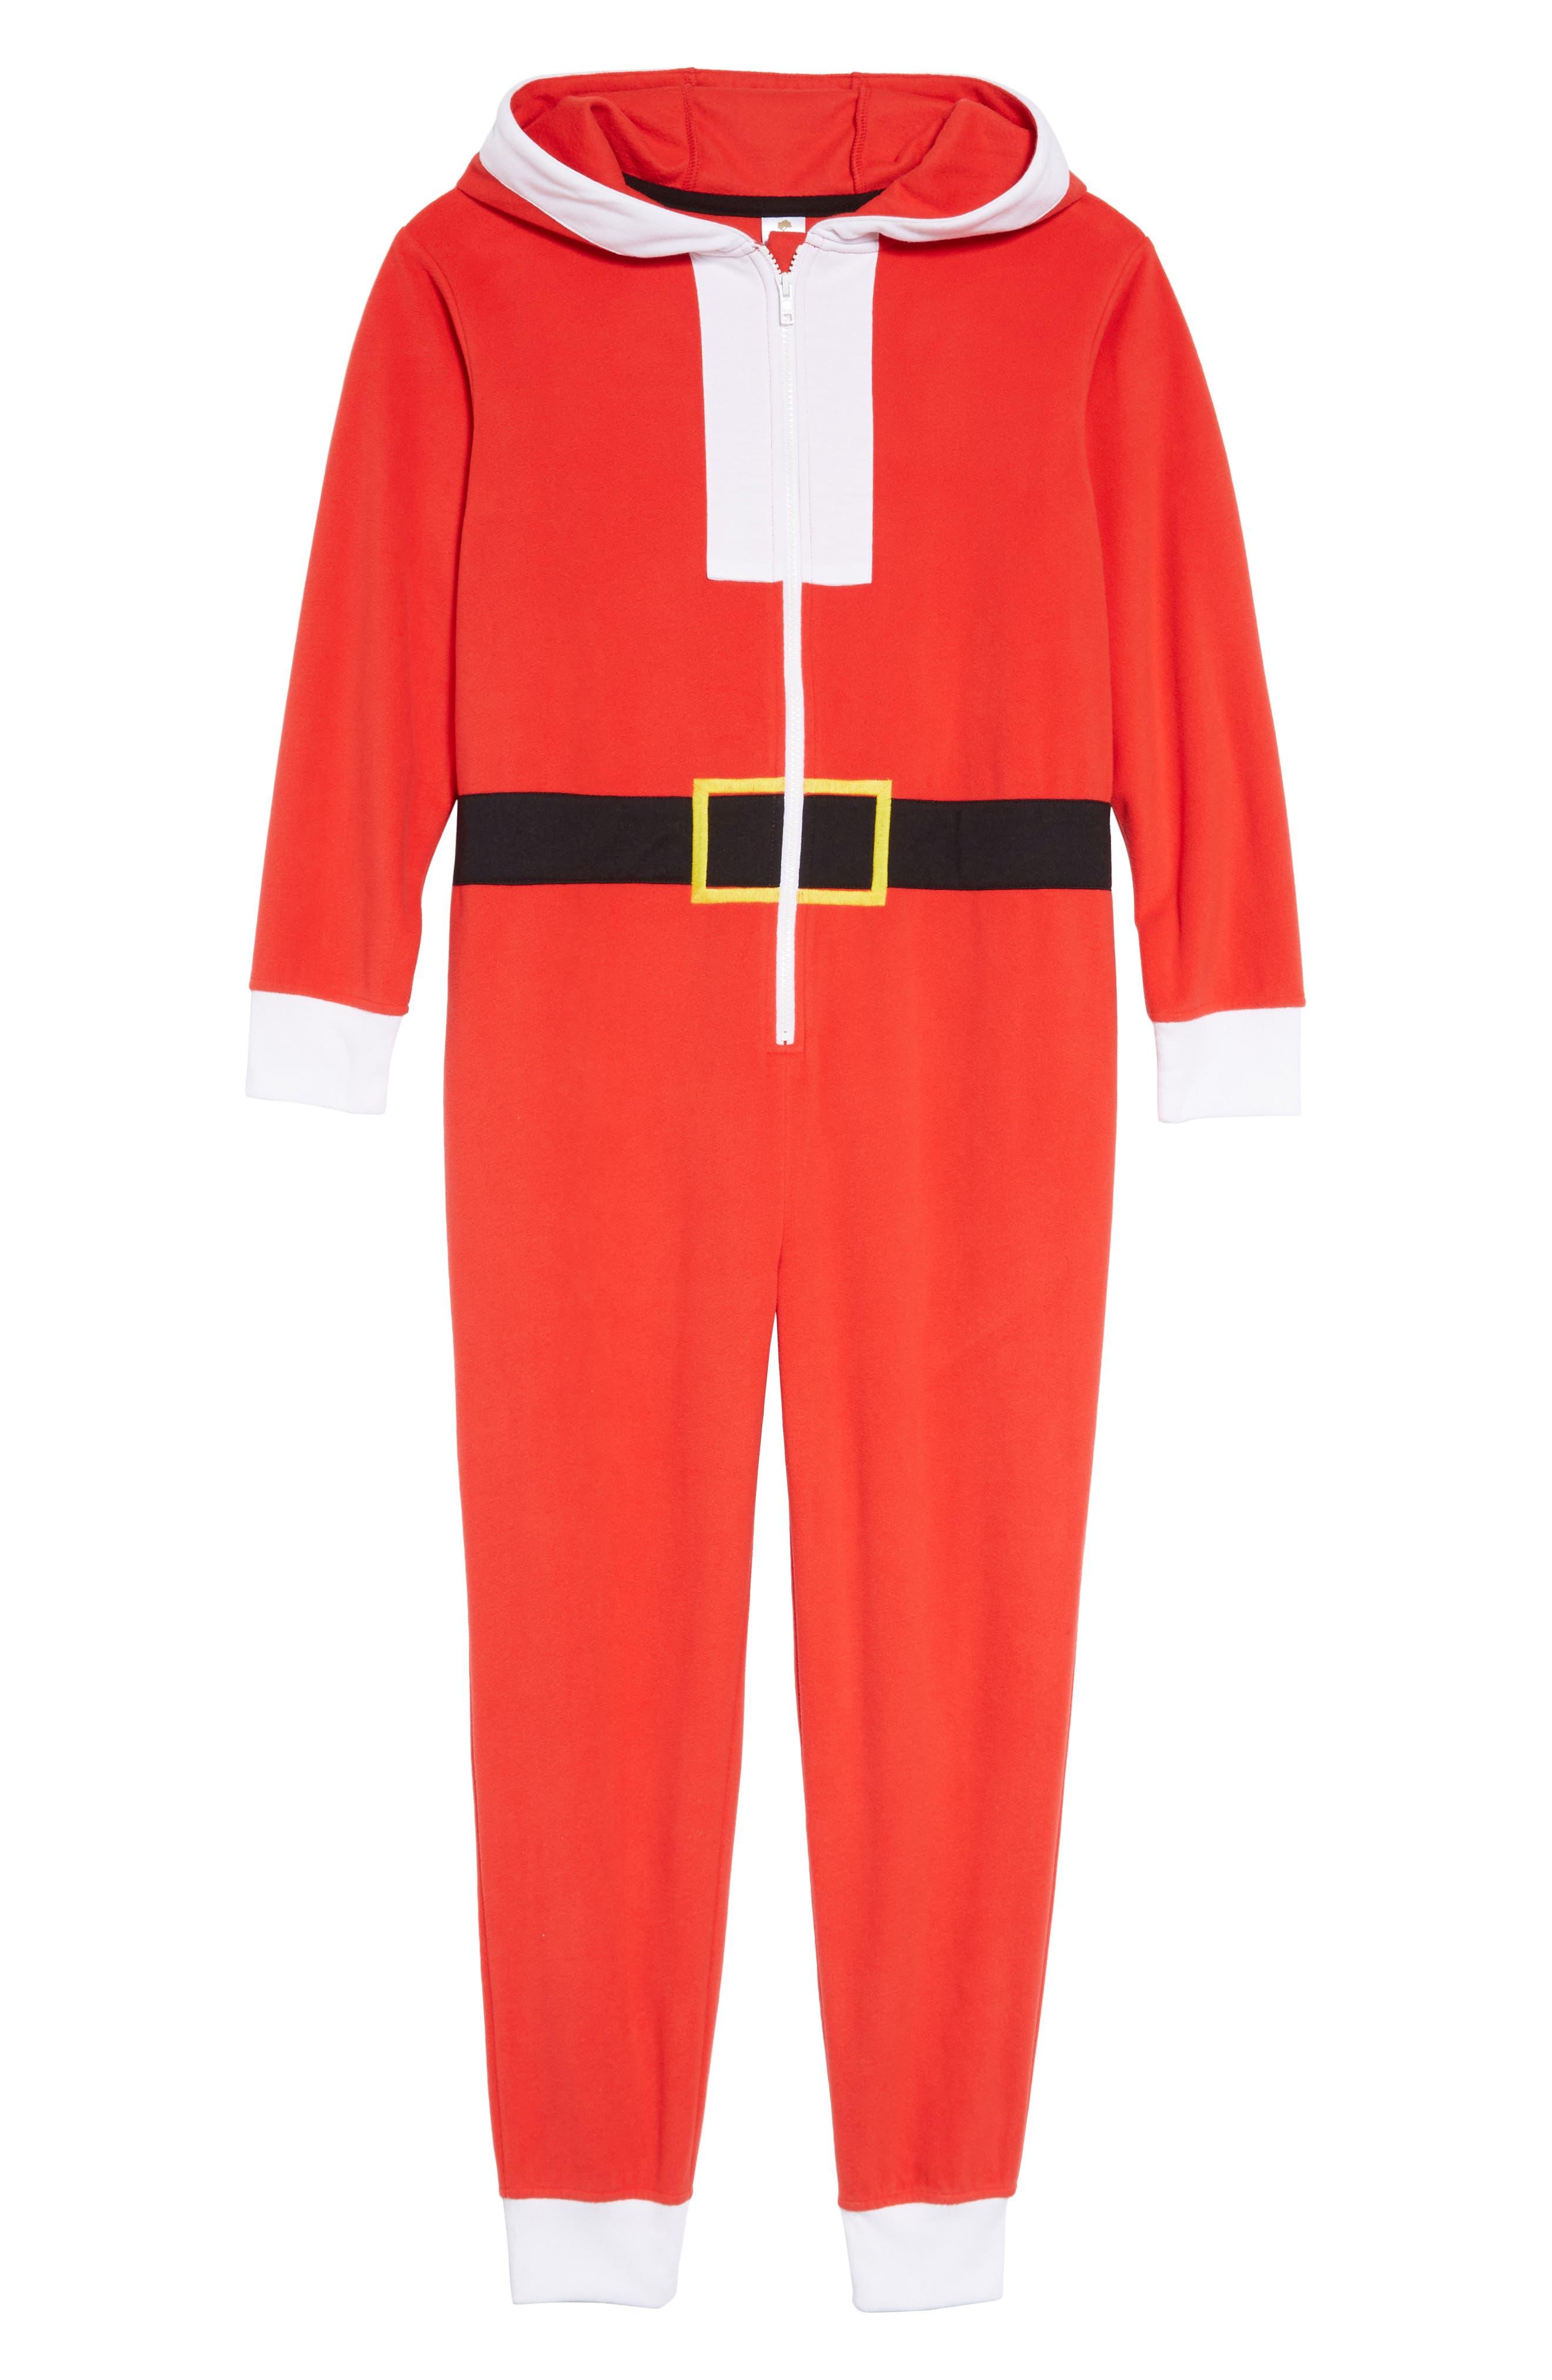 Santa Hooded One-Piece Pajamas,                         Main,                         color, RED BLOOM SANTA SUIT